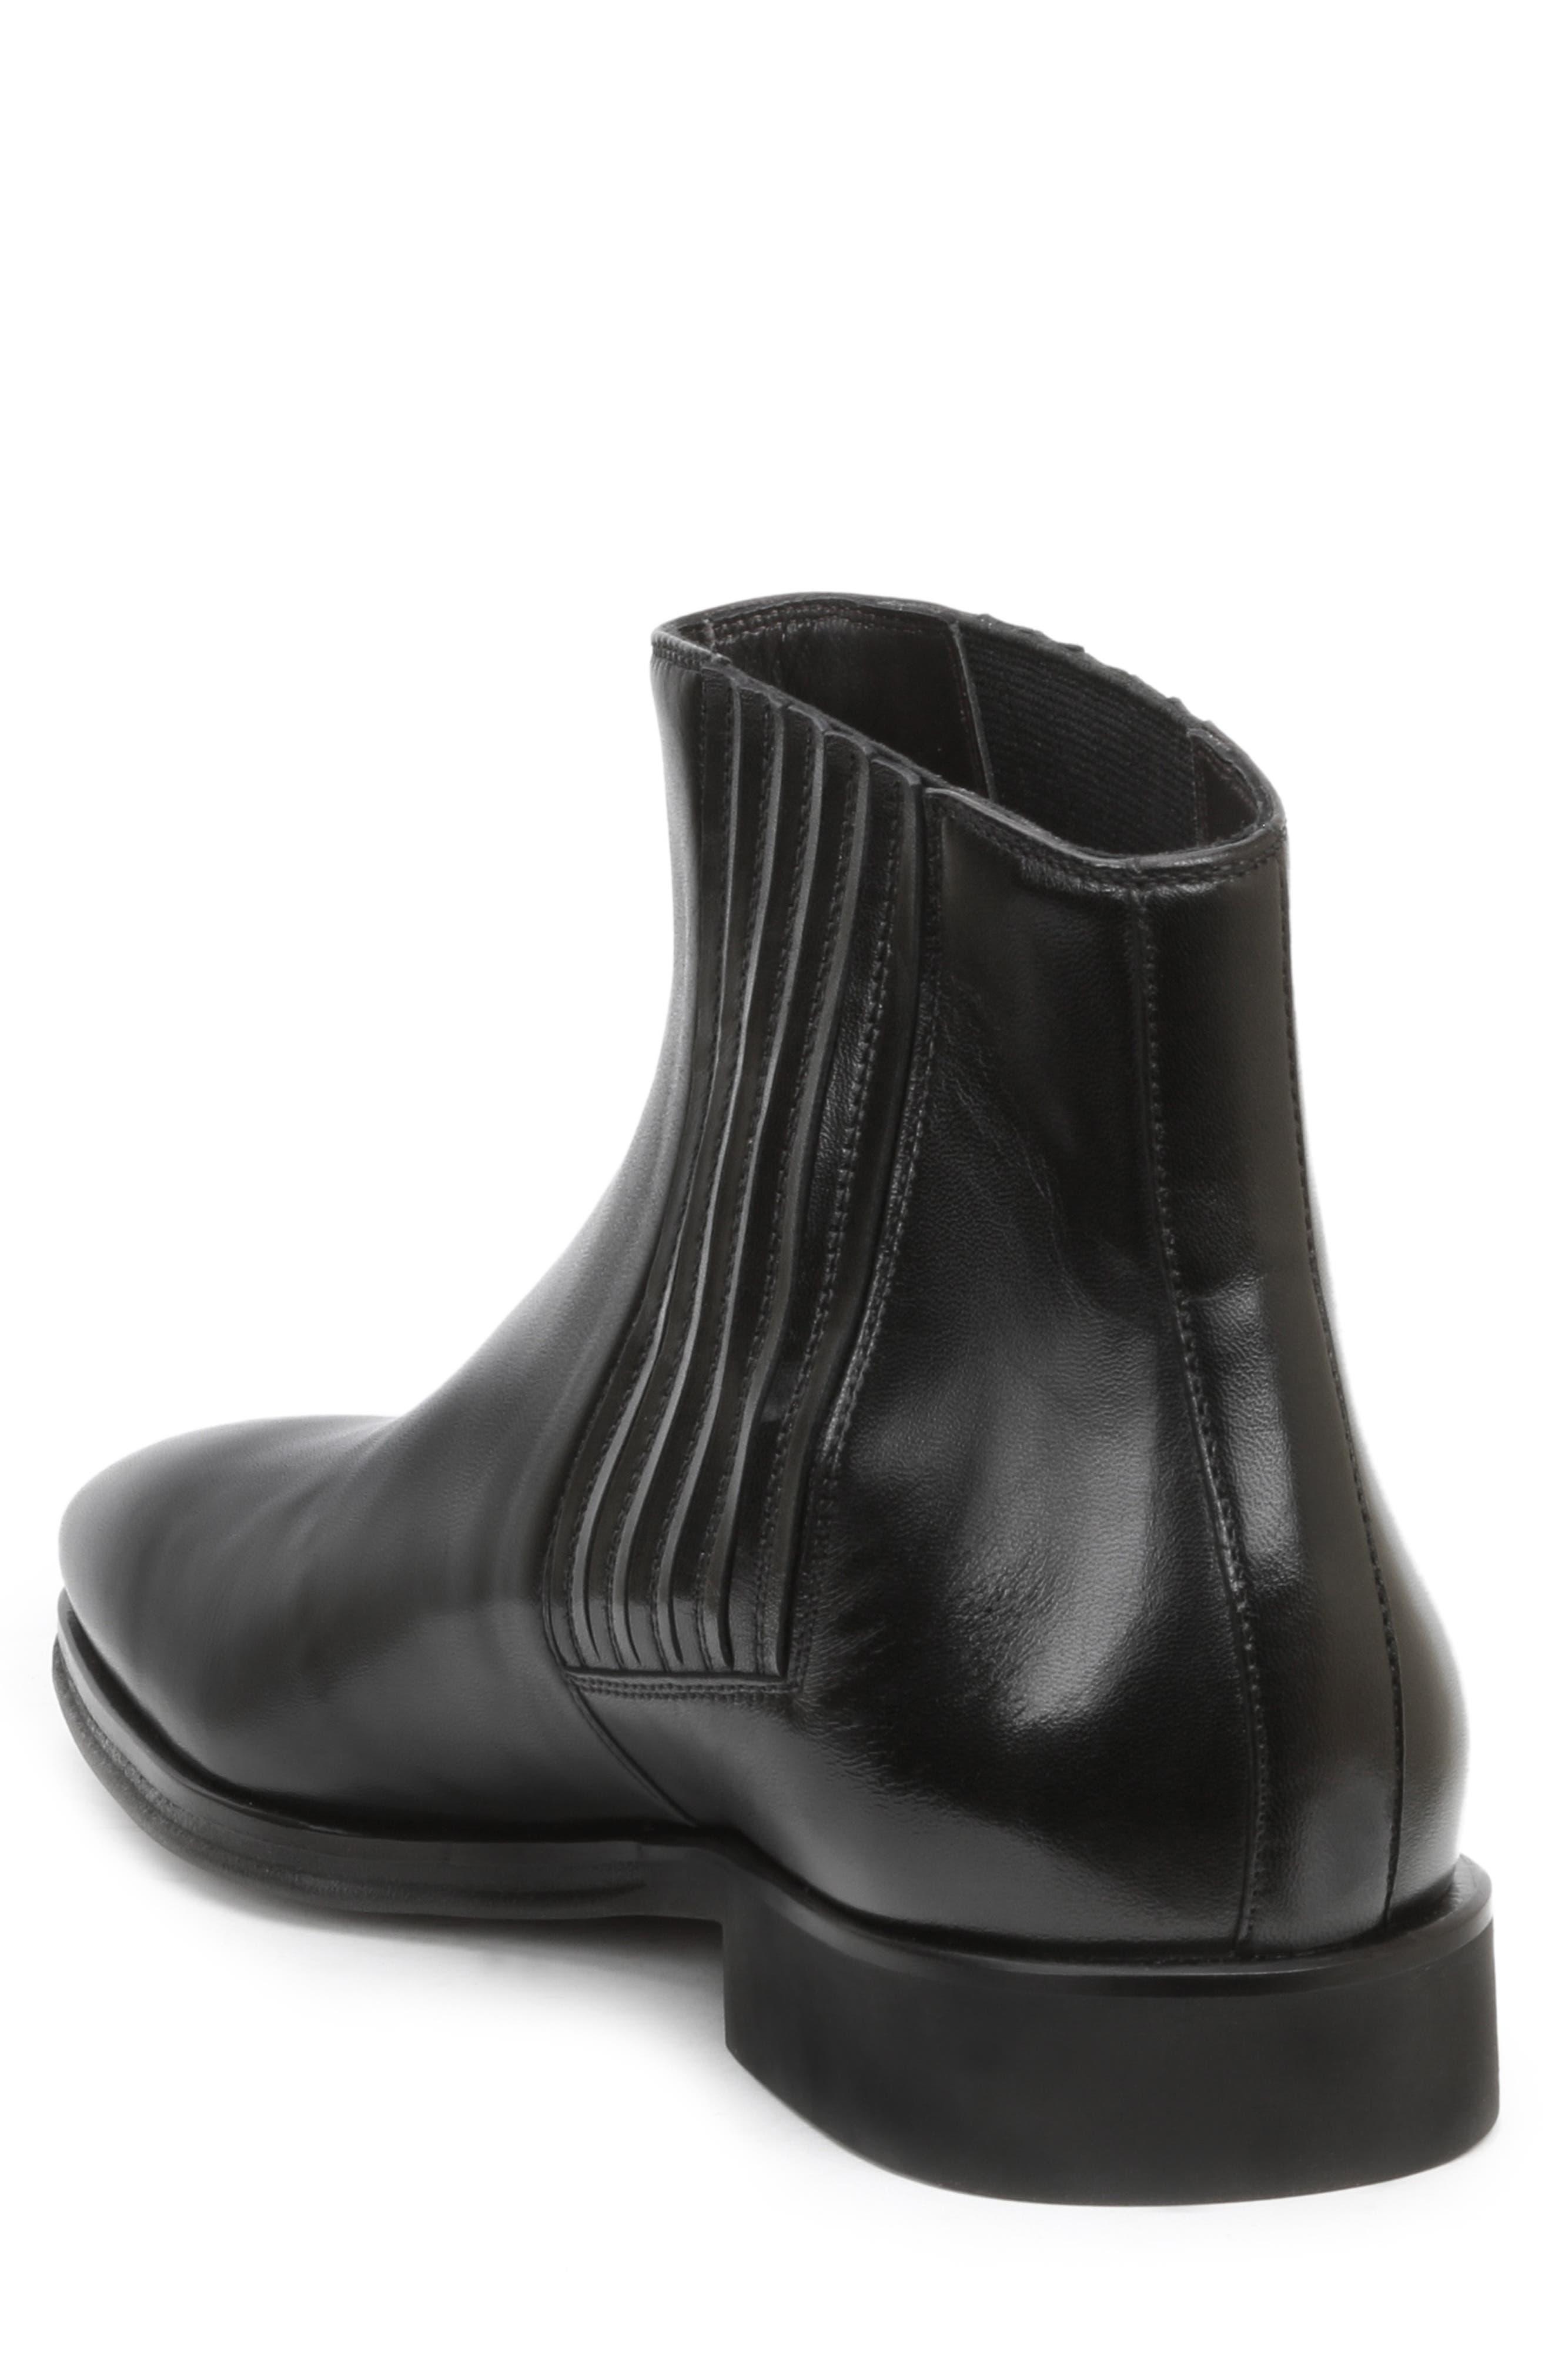 Rezzo Chelsea Boot,                             Alternate thumbnail 2, color,                             BLACK